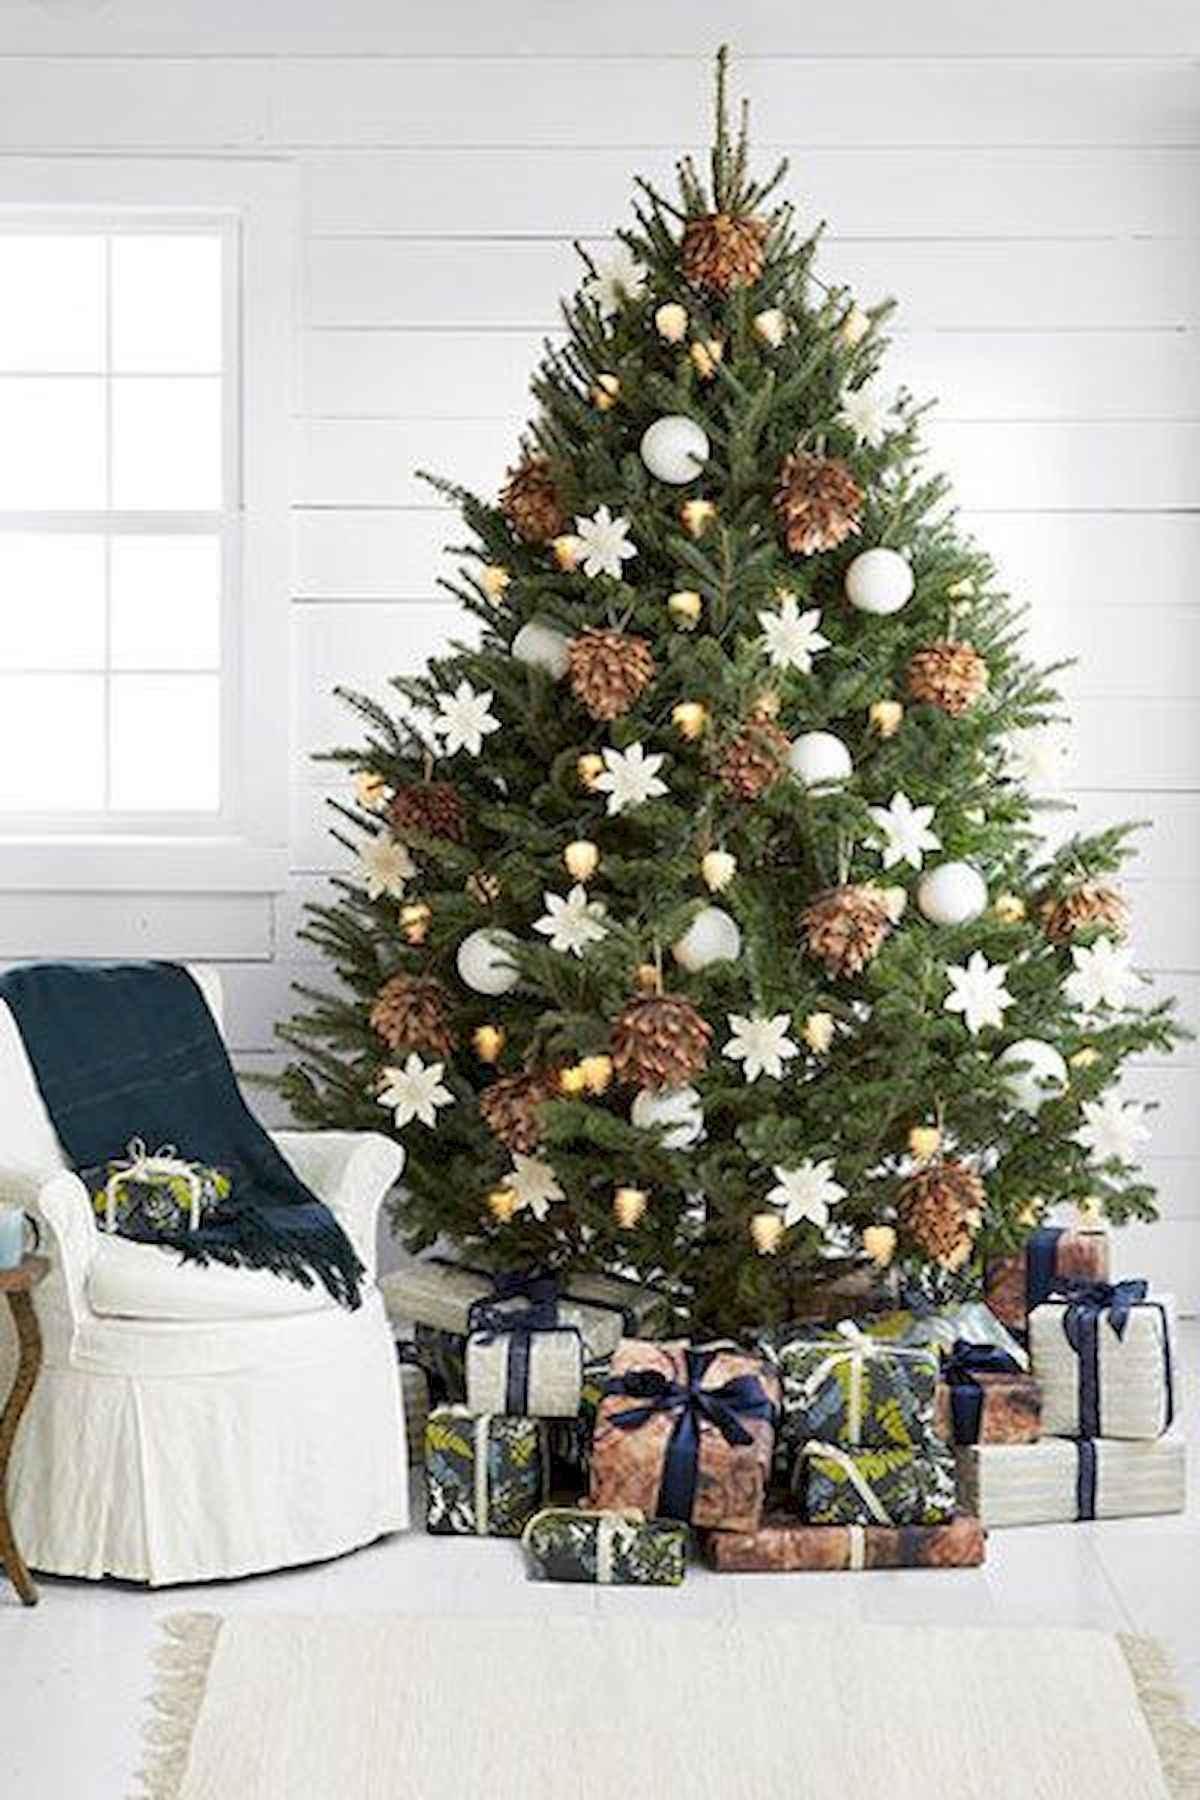 ... 1200 × 1800 in 60 Elegant Christmas Decorations Ideas